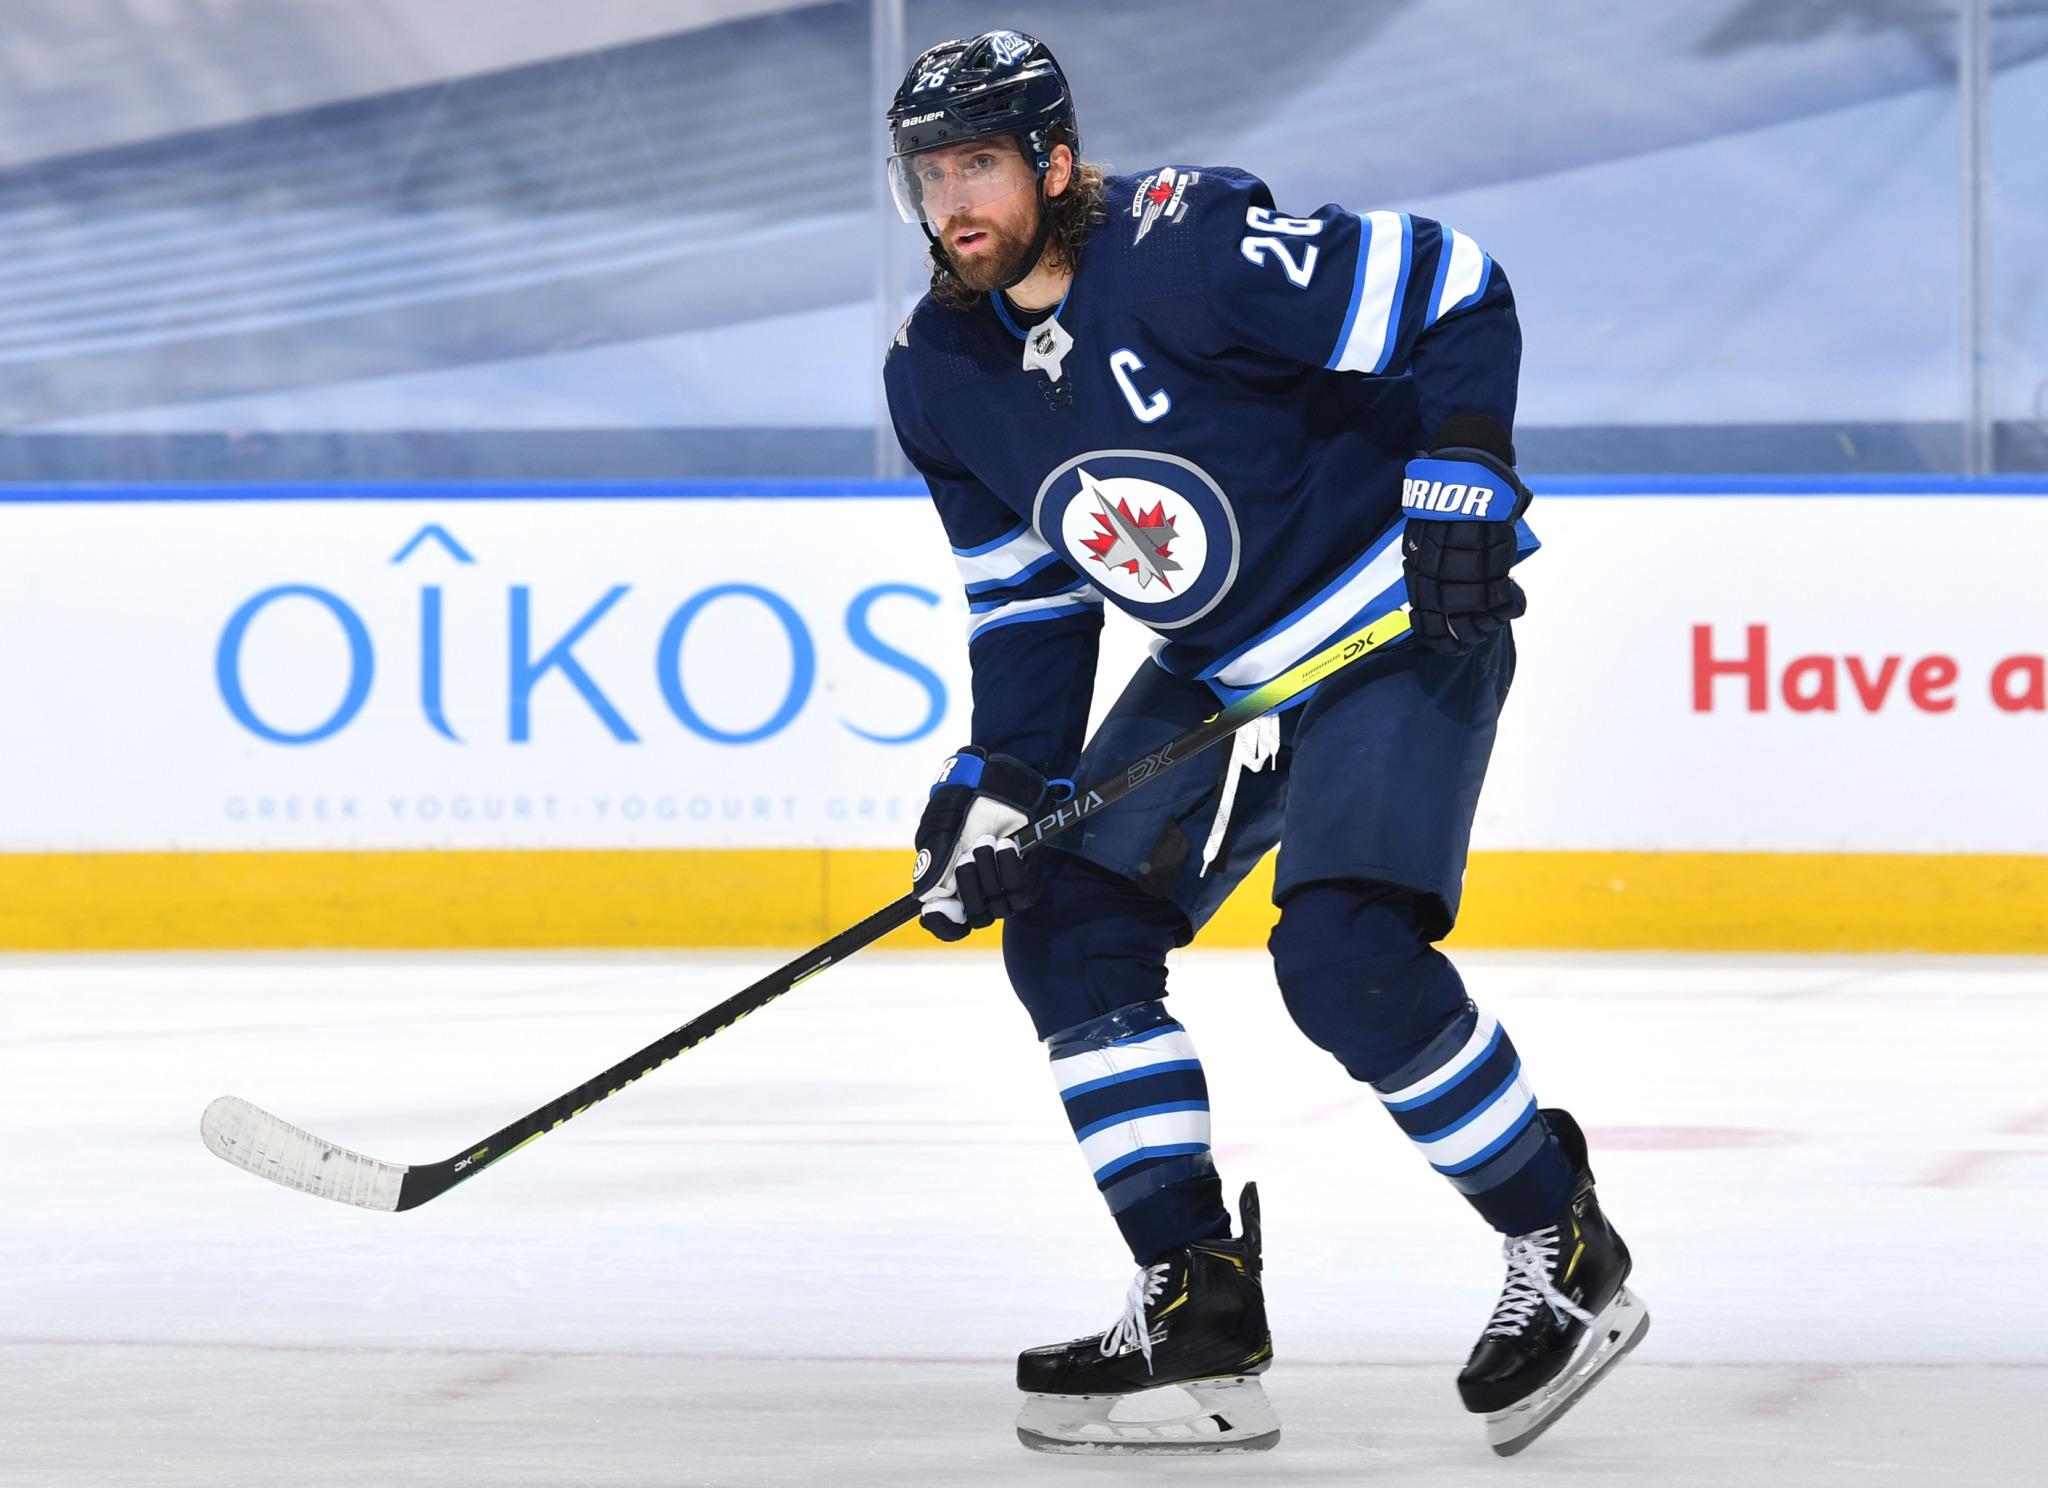 TSN Announces 2020-2021 Winnipeg Jets Regional NHL Broadcast Schedule